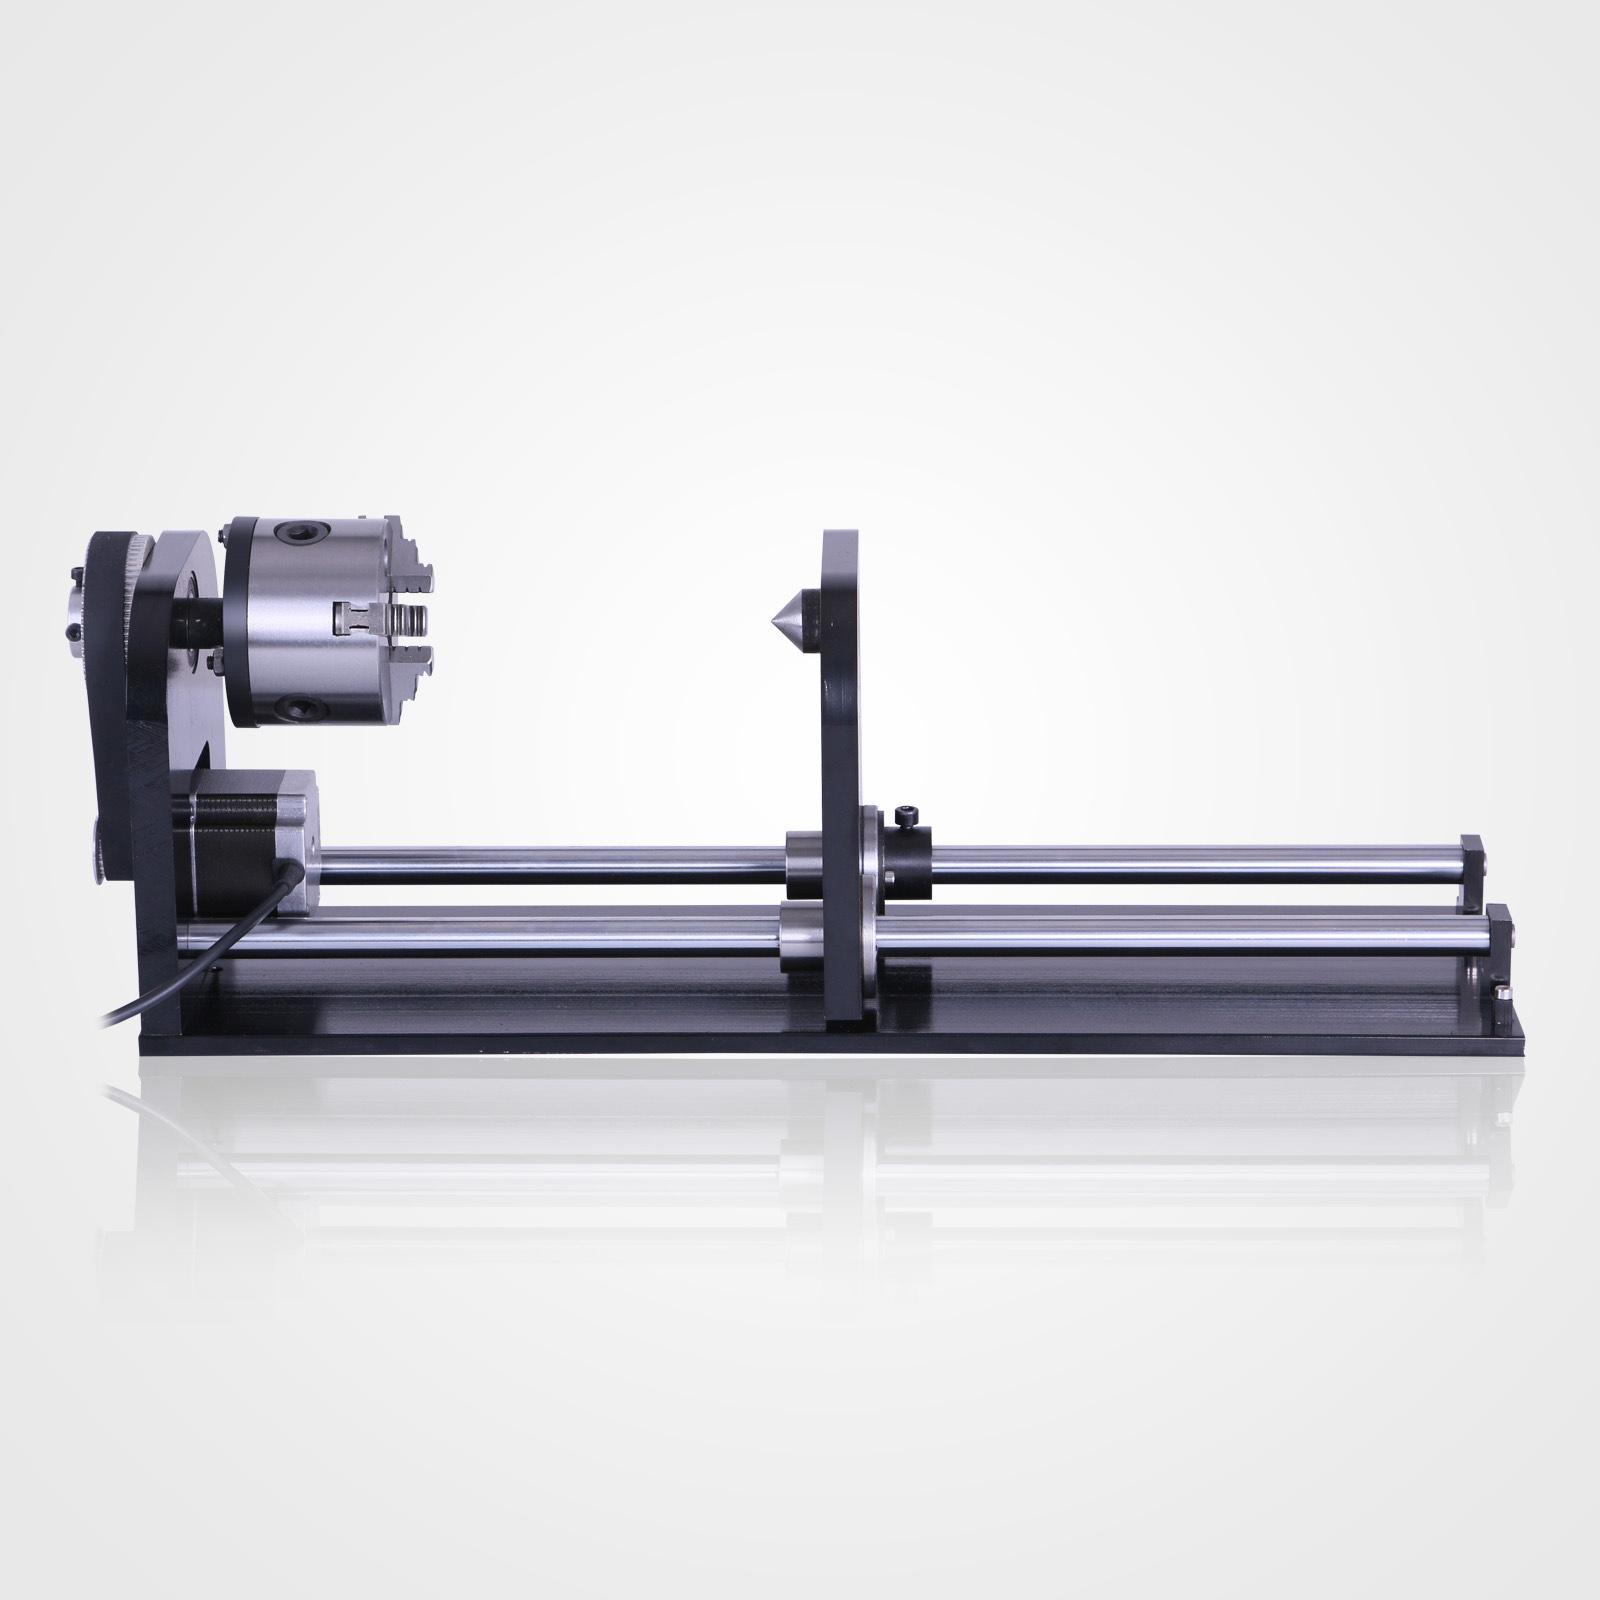 Macchina-per-Incisione-Laser-CO2-40-130W-Asse-Rotante-Tagliatrice-Incisore miniatura 87